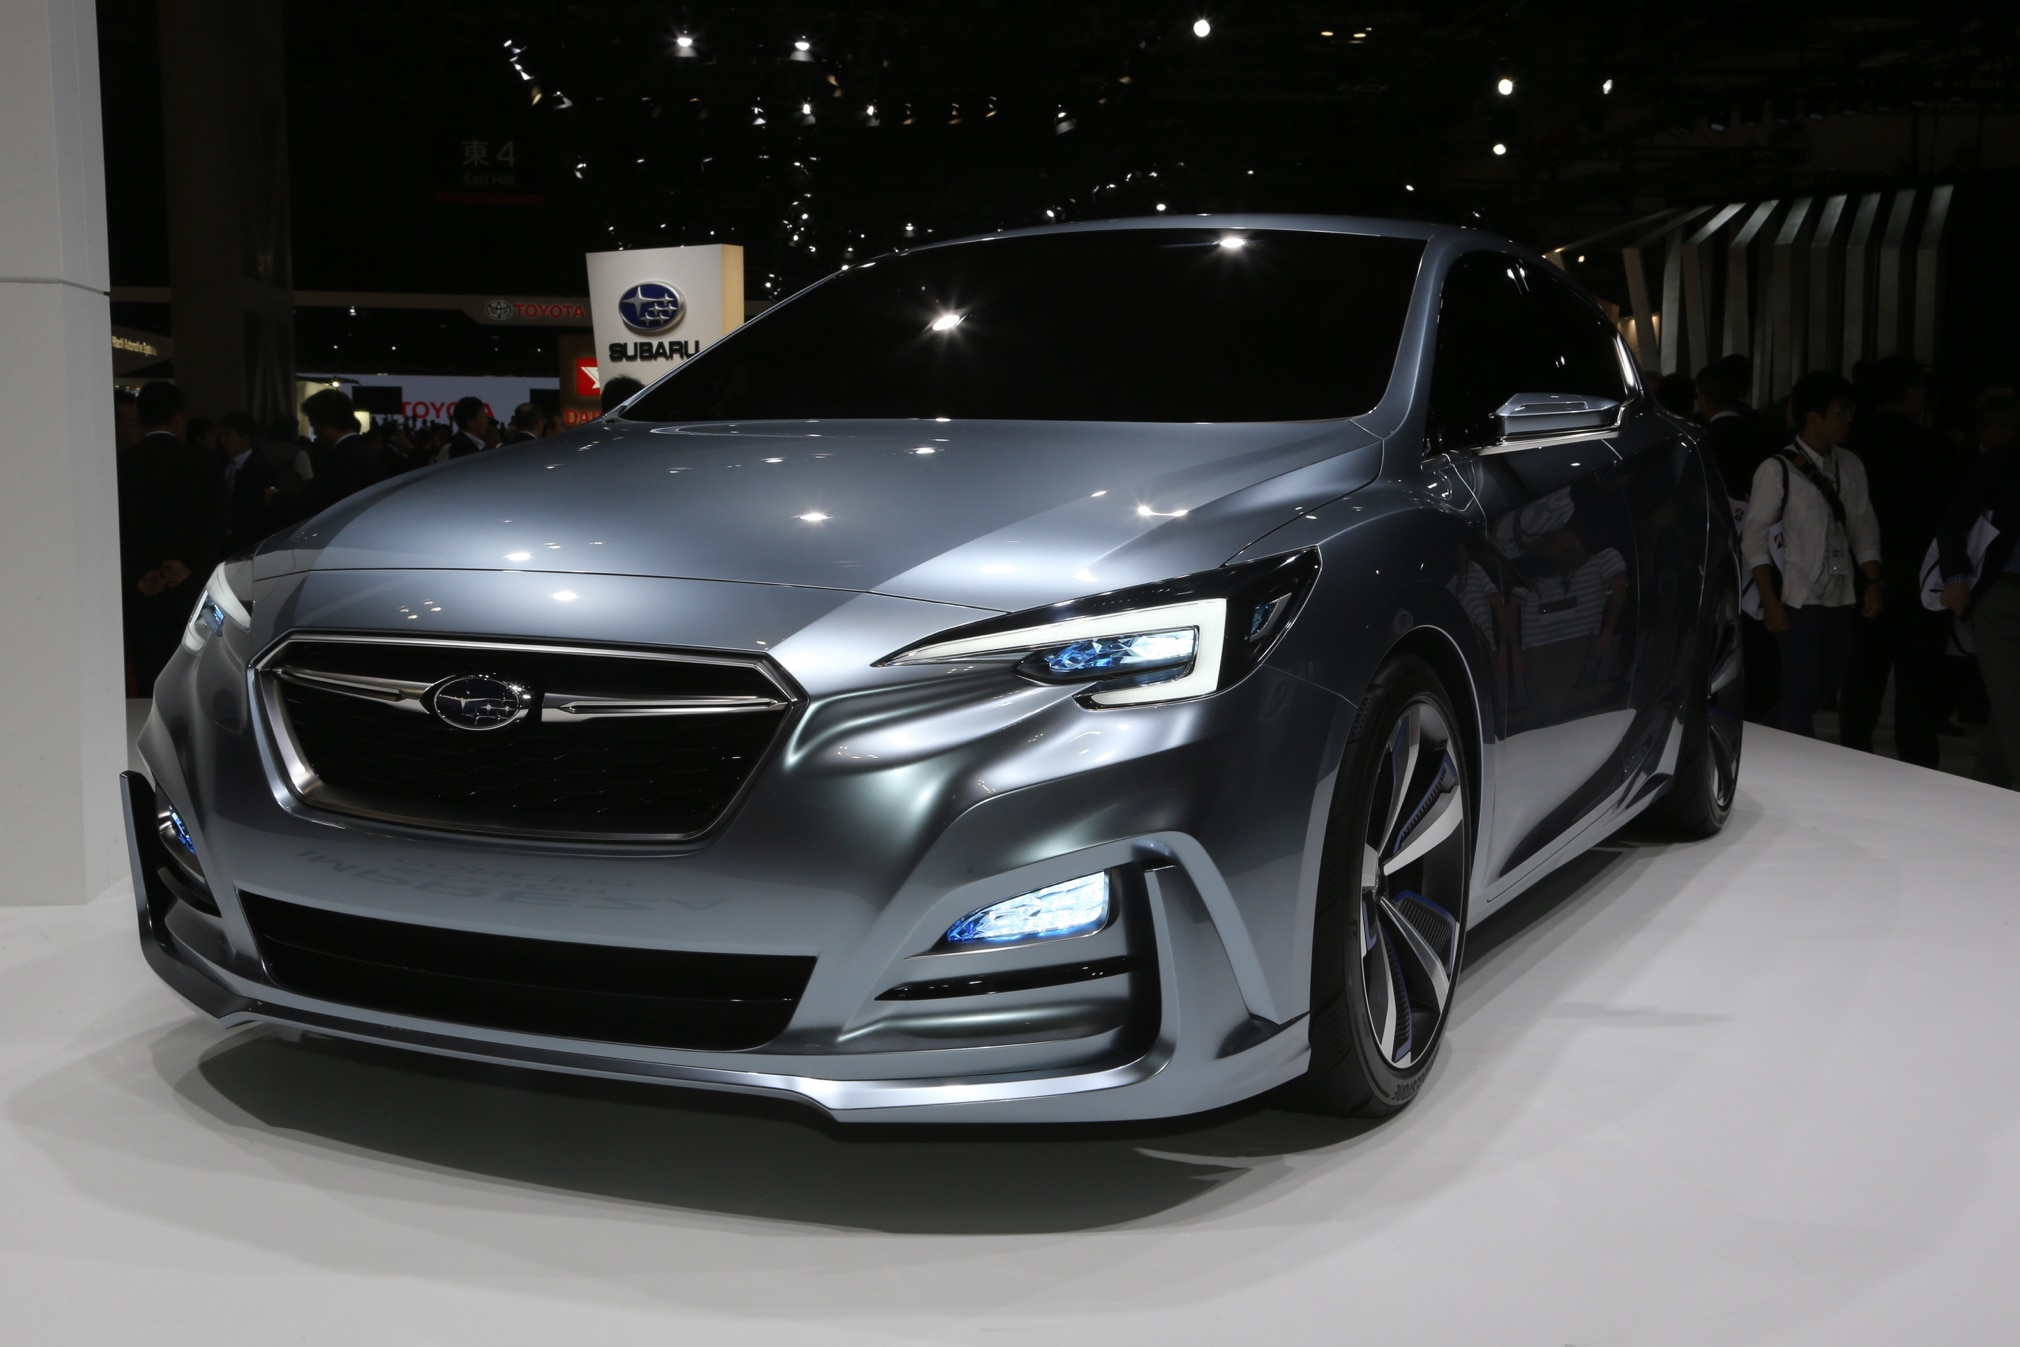 Subaru Impreza Concept front three quarter